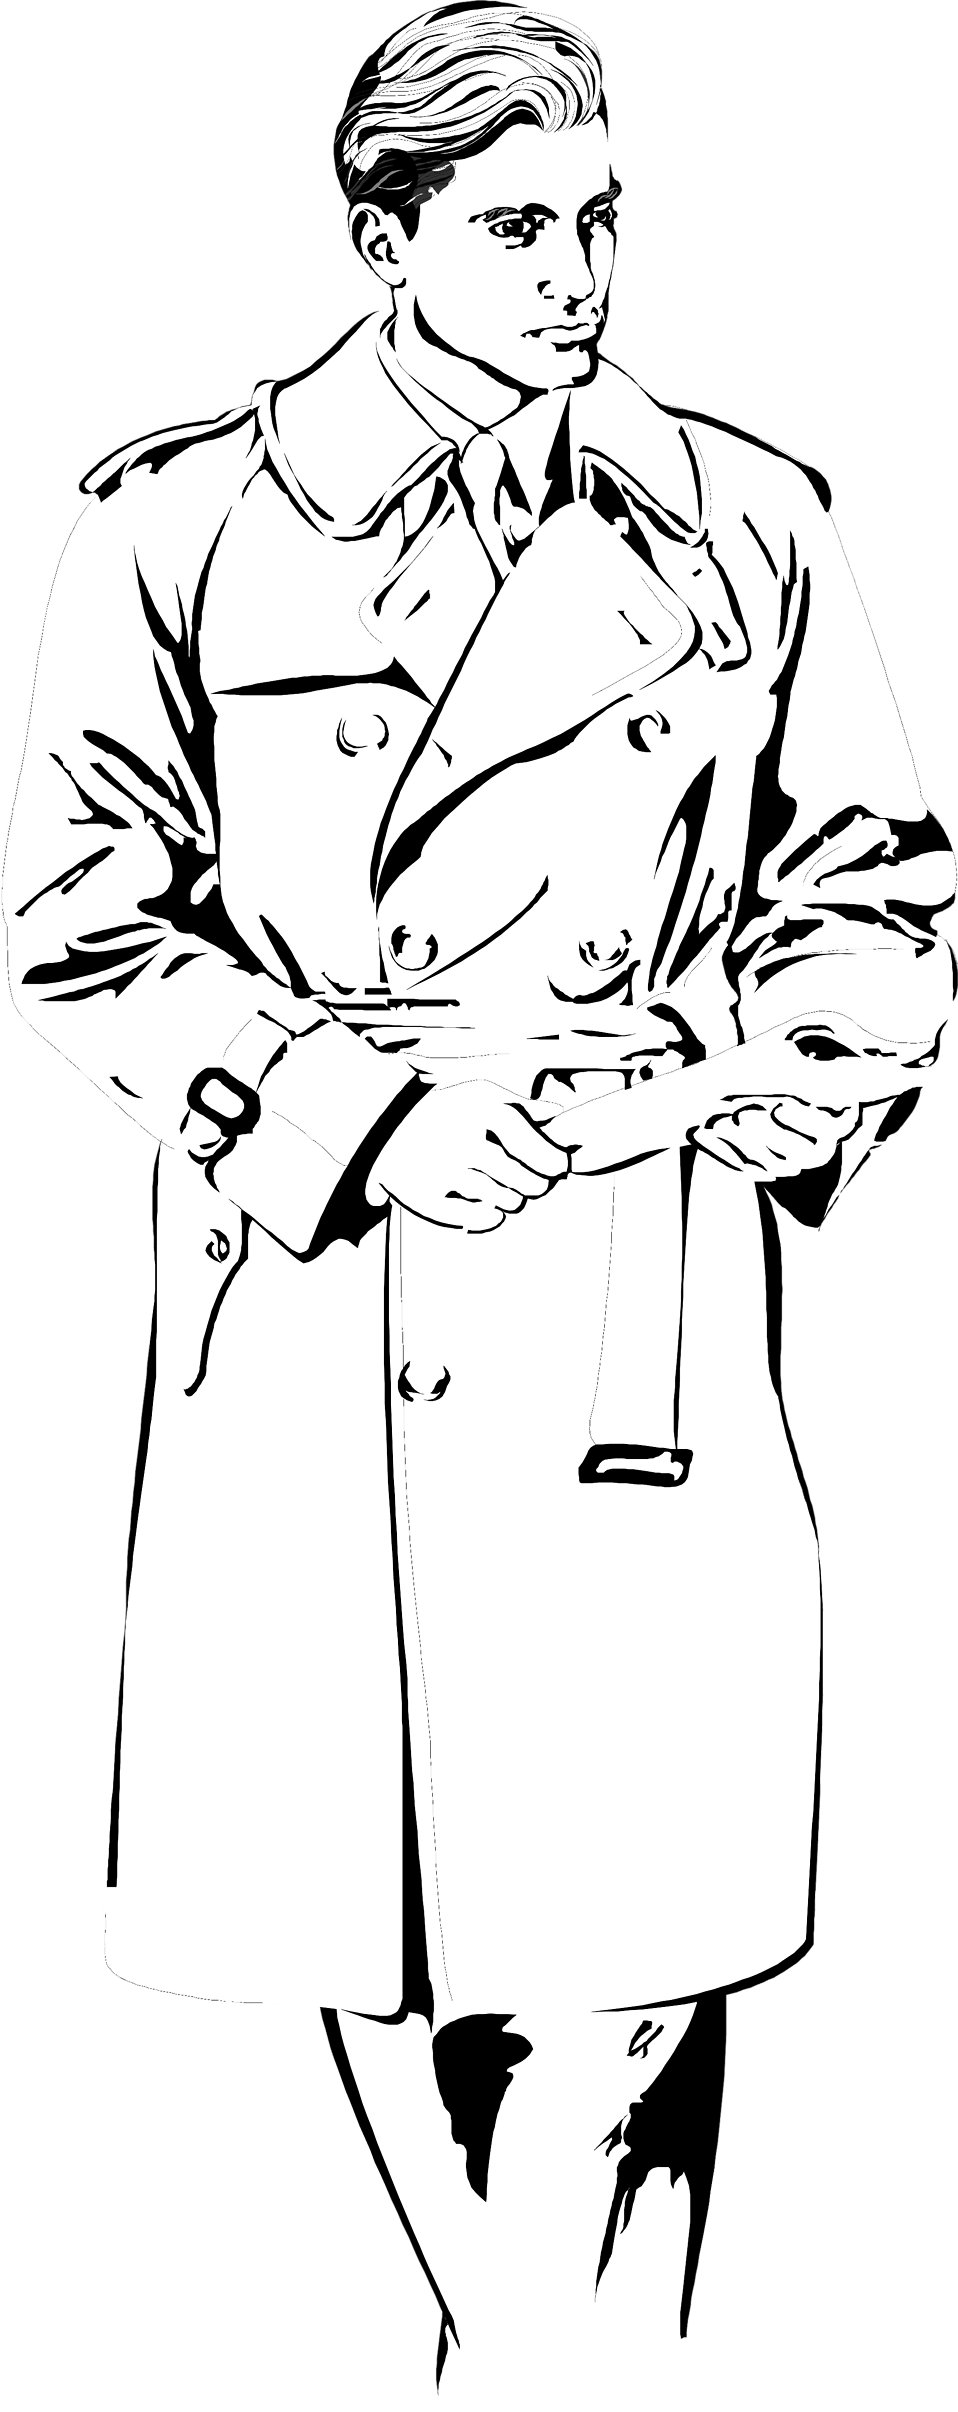 Clip art wallpapersskin illustration. Coat clipart rain poncho